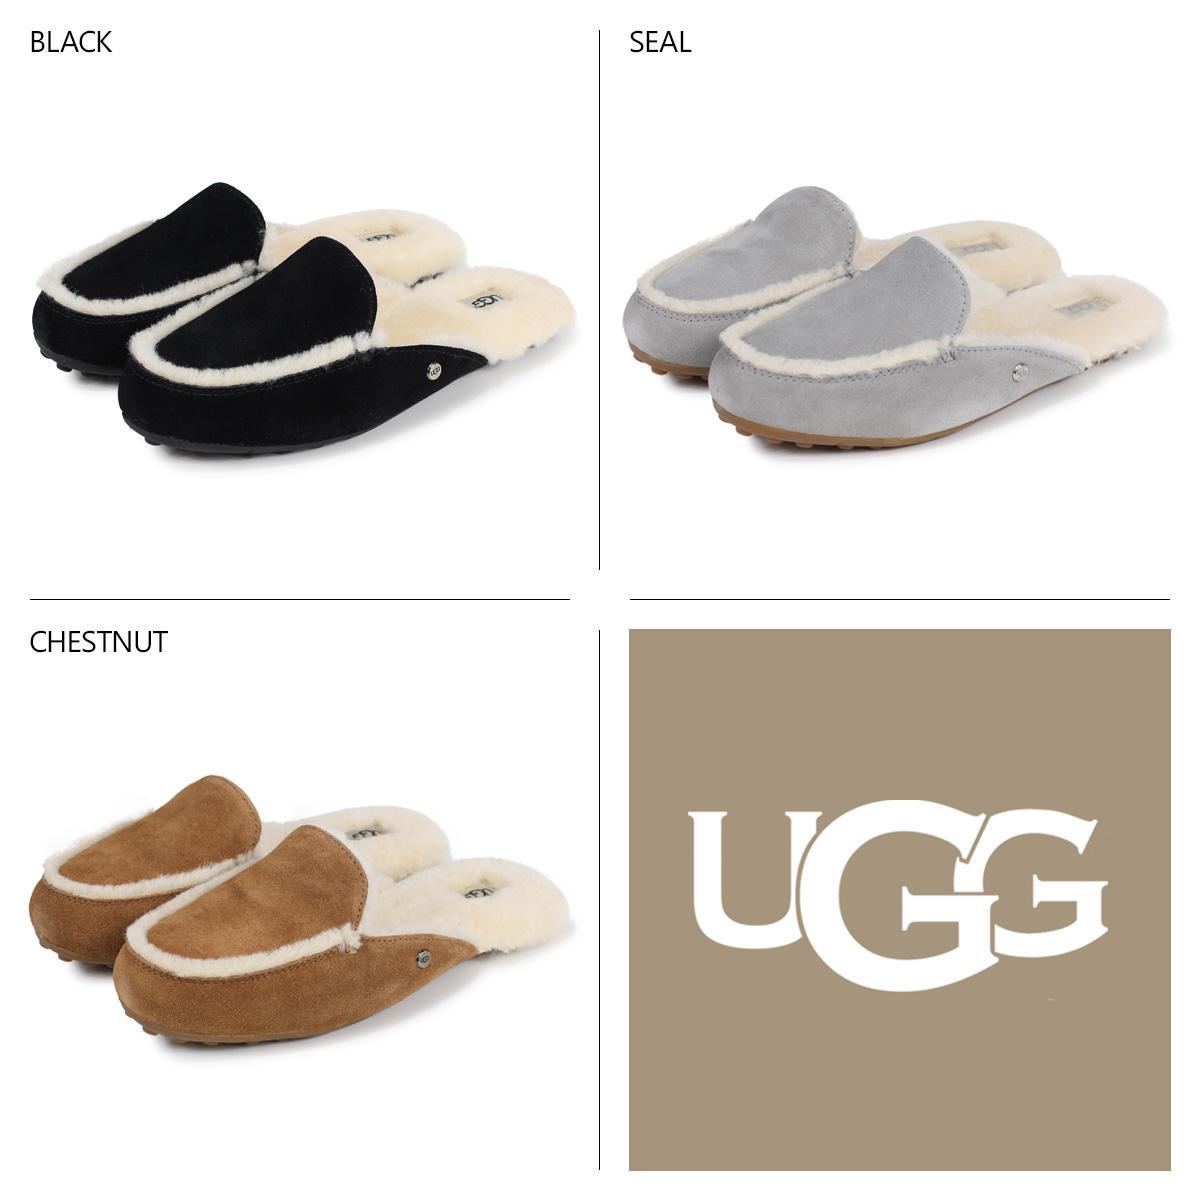 2e1626831 Sugar Online Shop: アグ UGG loafer slippers room shoes lane Lady's mouton  sheepskin WOMENS LANE 1020027 [1/18 Shinnyu load]   Rakuten Global Market